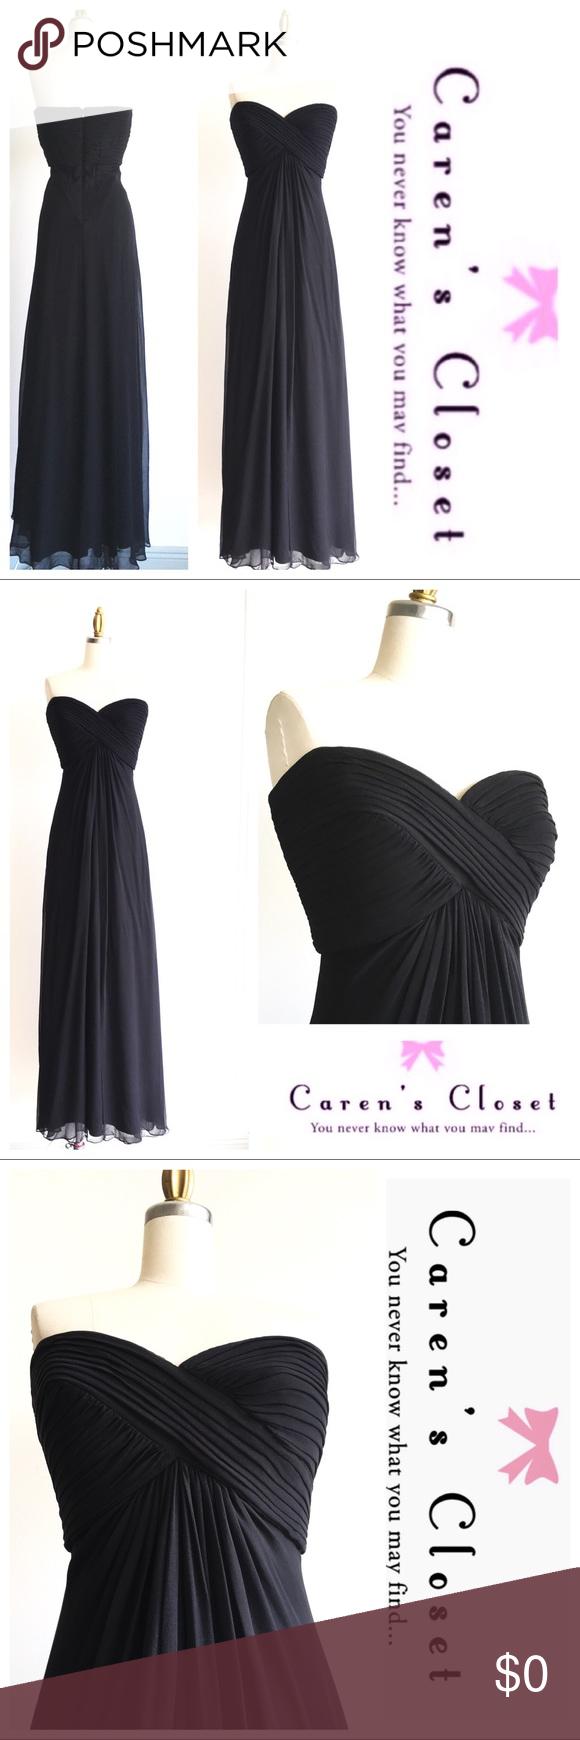 Tadashi Shoji Black Silk Strapless Formal Gown Tadashi Shoji Dresses Clothes Design Black Silk [ 1740 x 580 Pixel ]